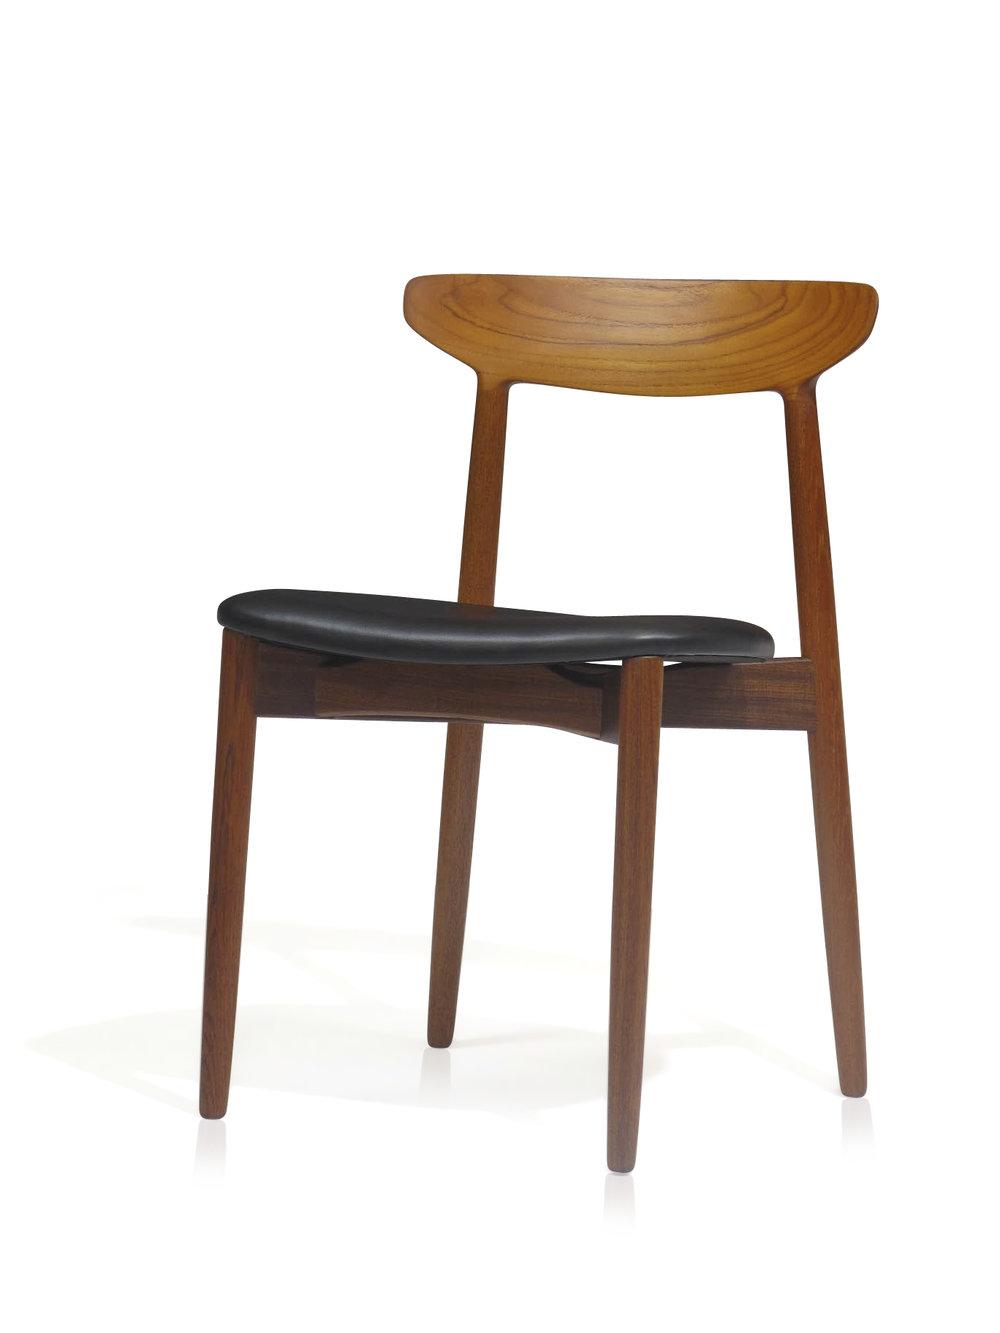 ... Danish, Teak, Dining Chairs, Midcentury, Furniture, Berkeley, ...